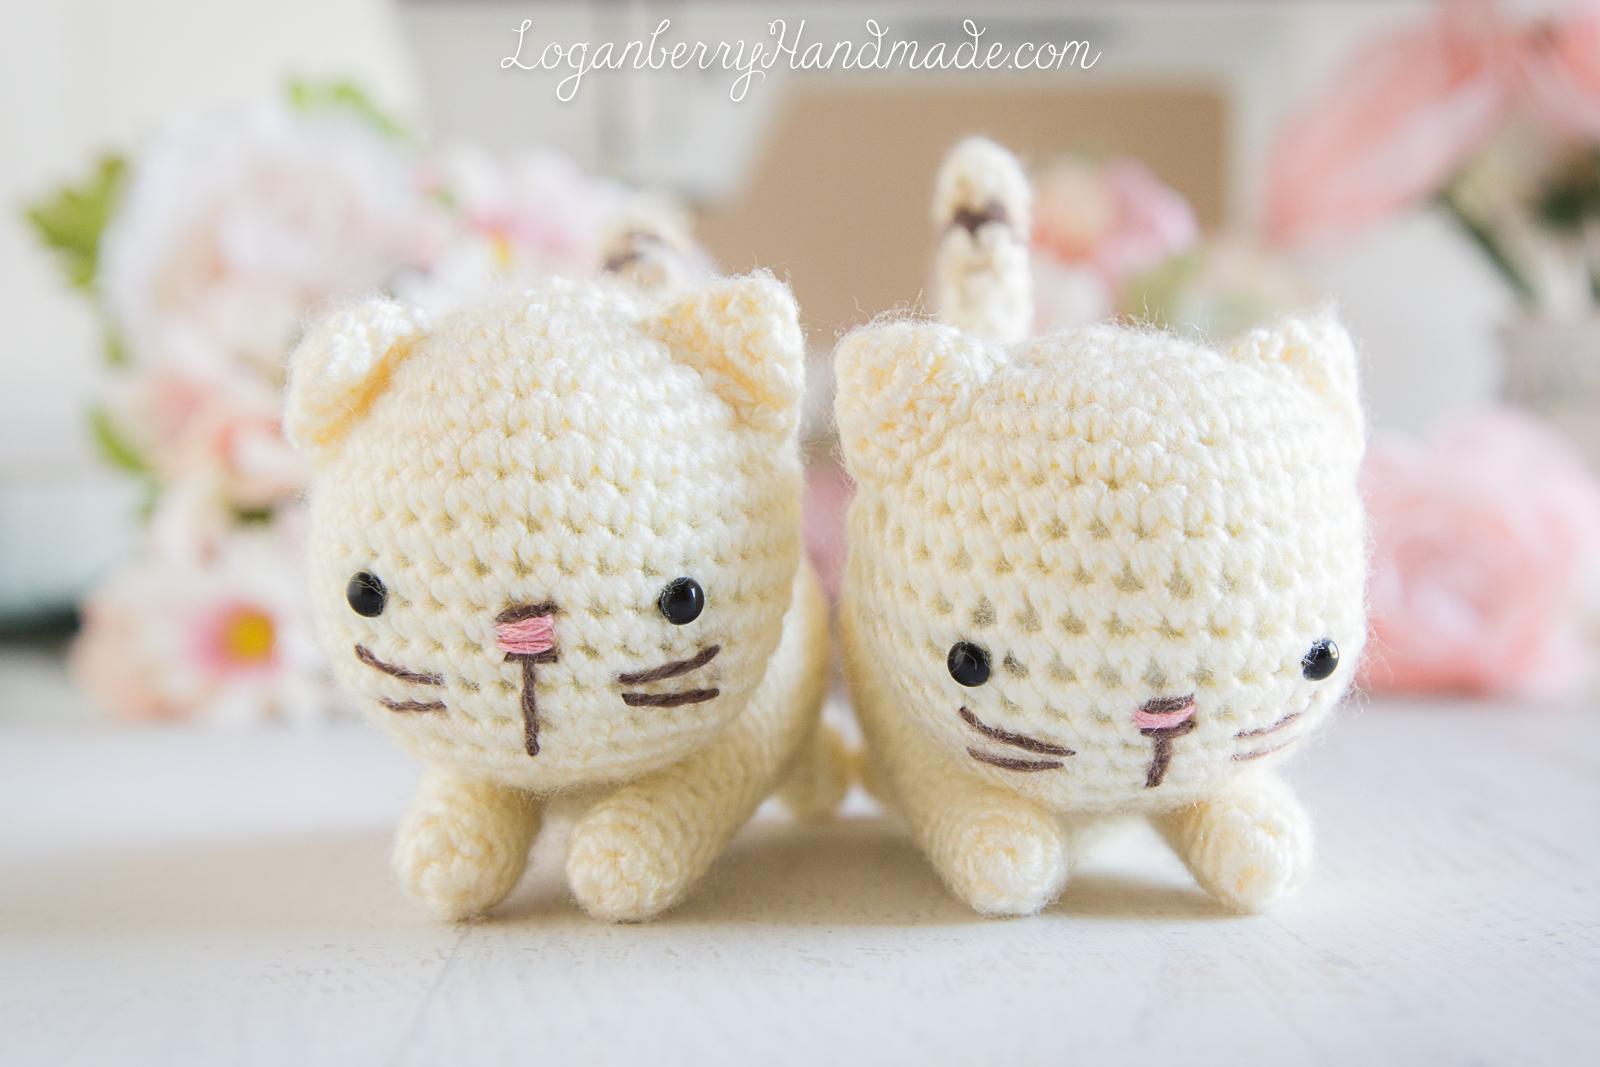 Amigurumi Fat Cat Crochet Free Pattern - Crochet & Knitting   1067x1600